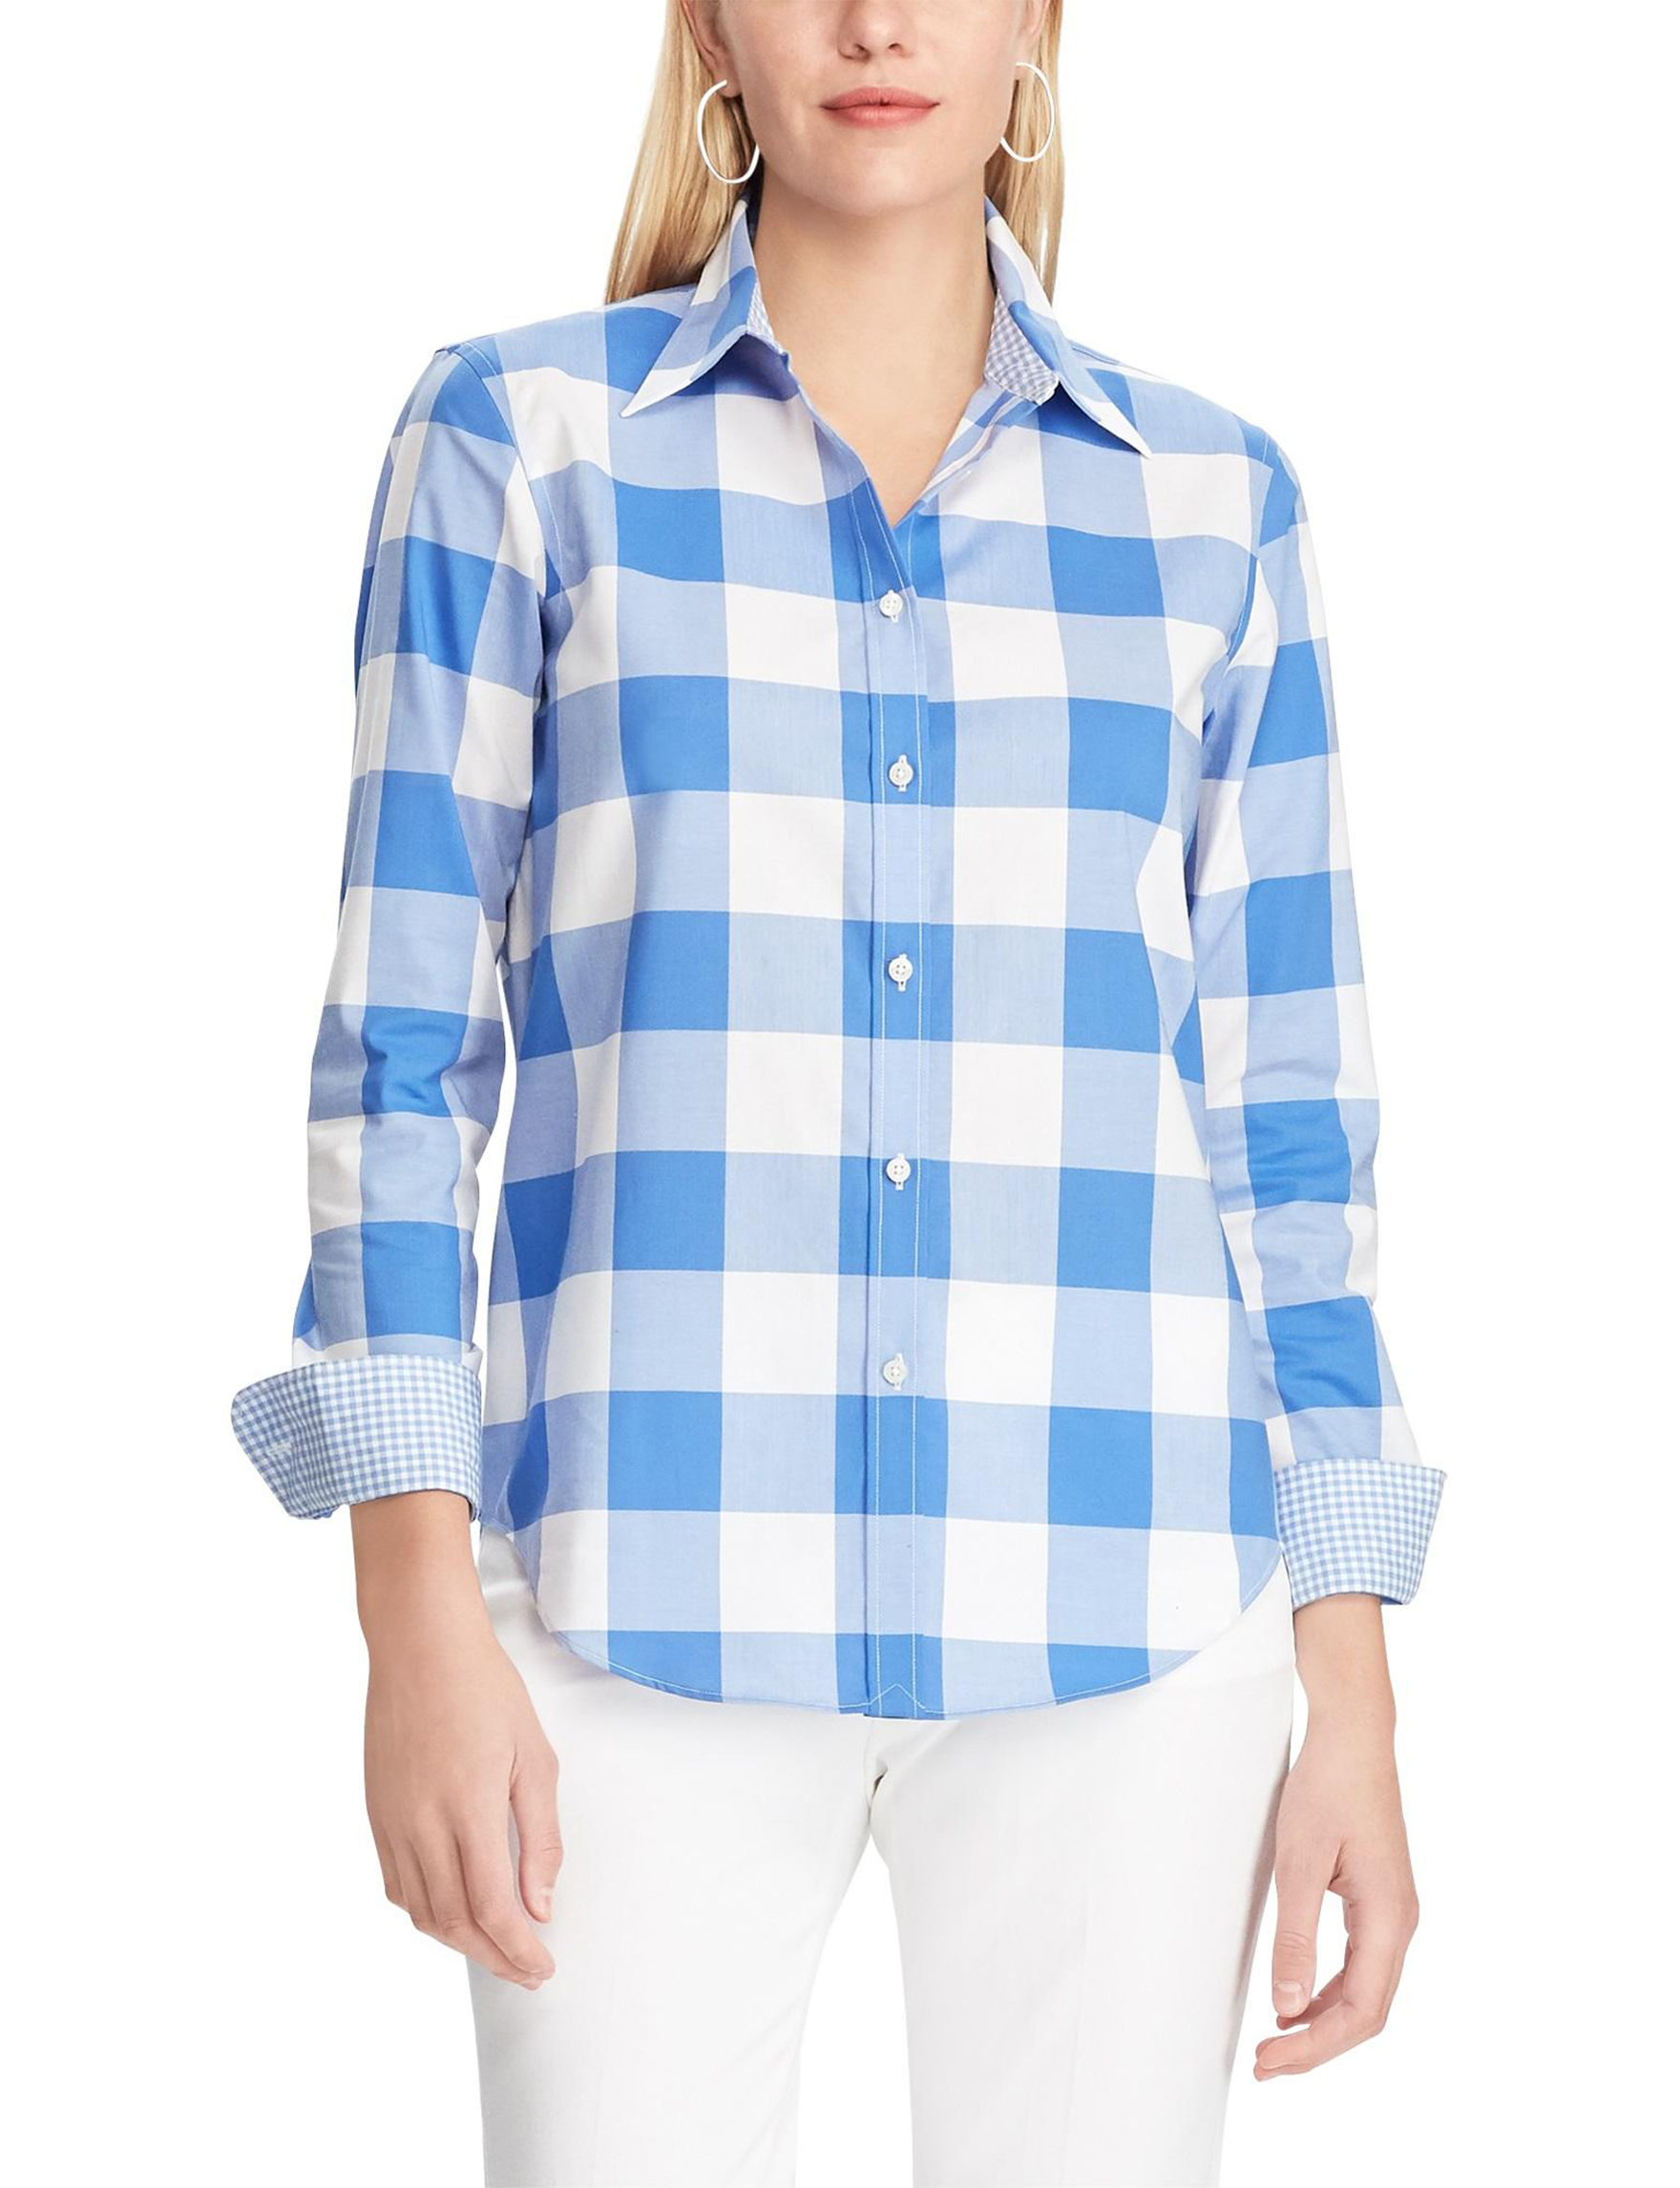 Chaps Blue / White Shirts & Blouses